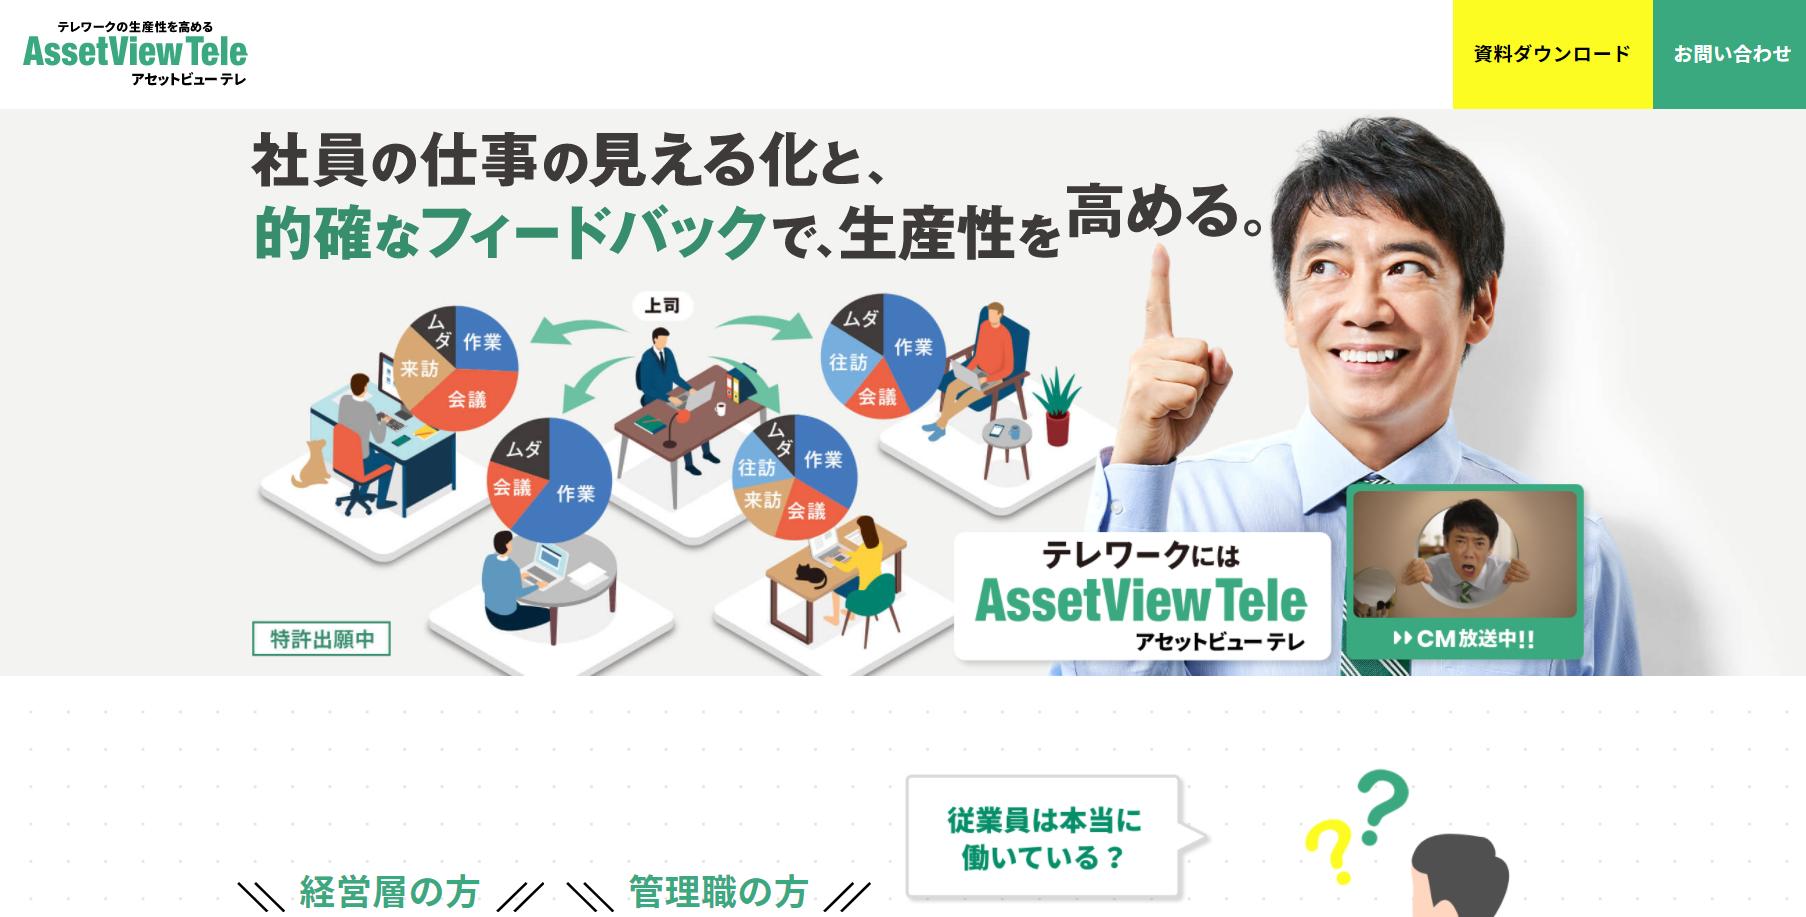 AssetView Tele